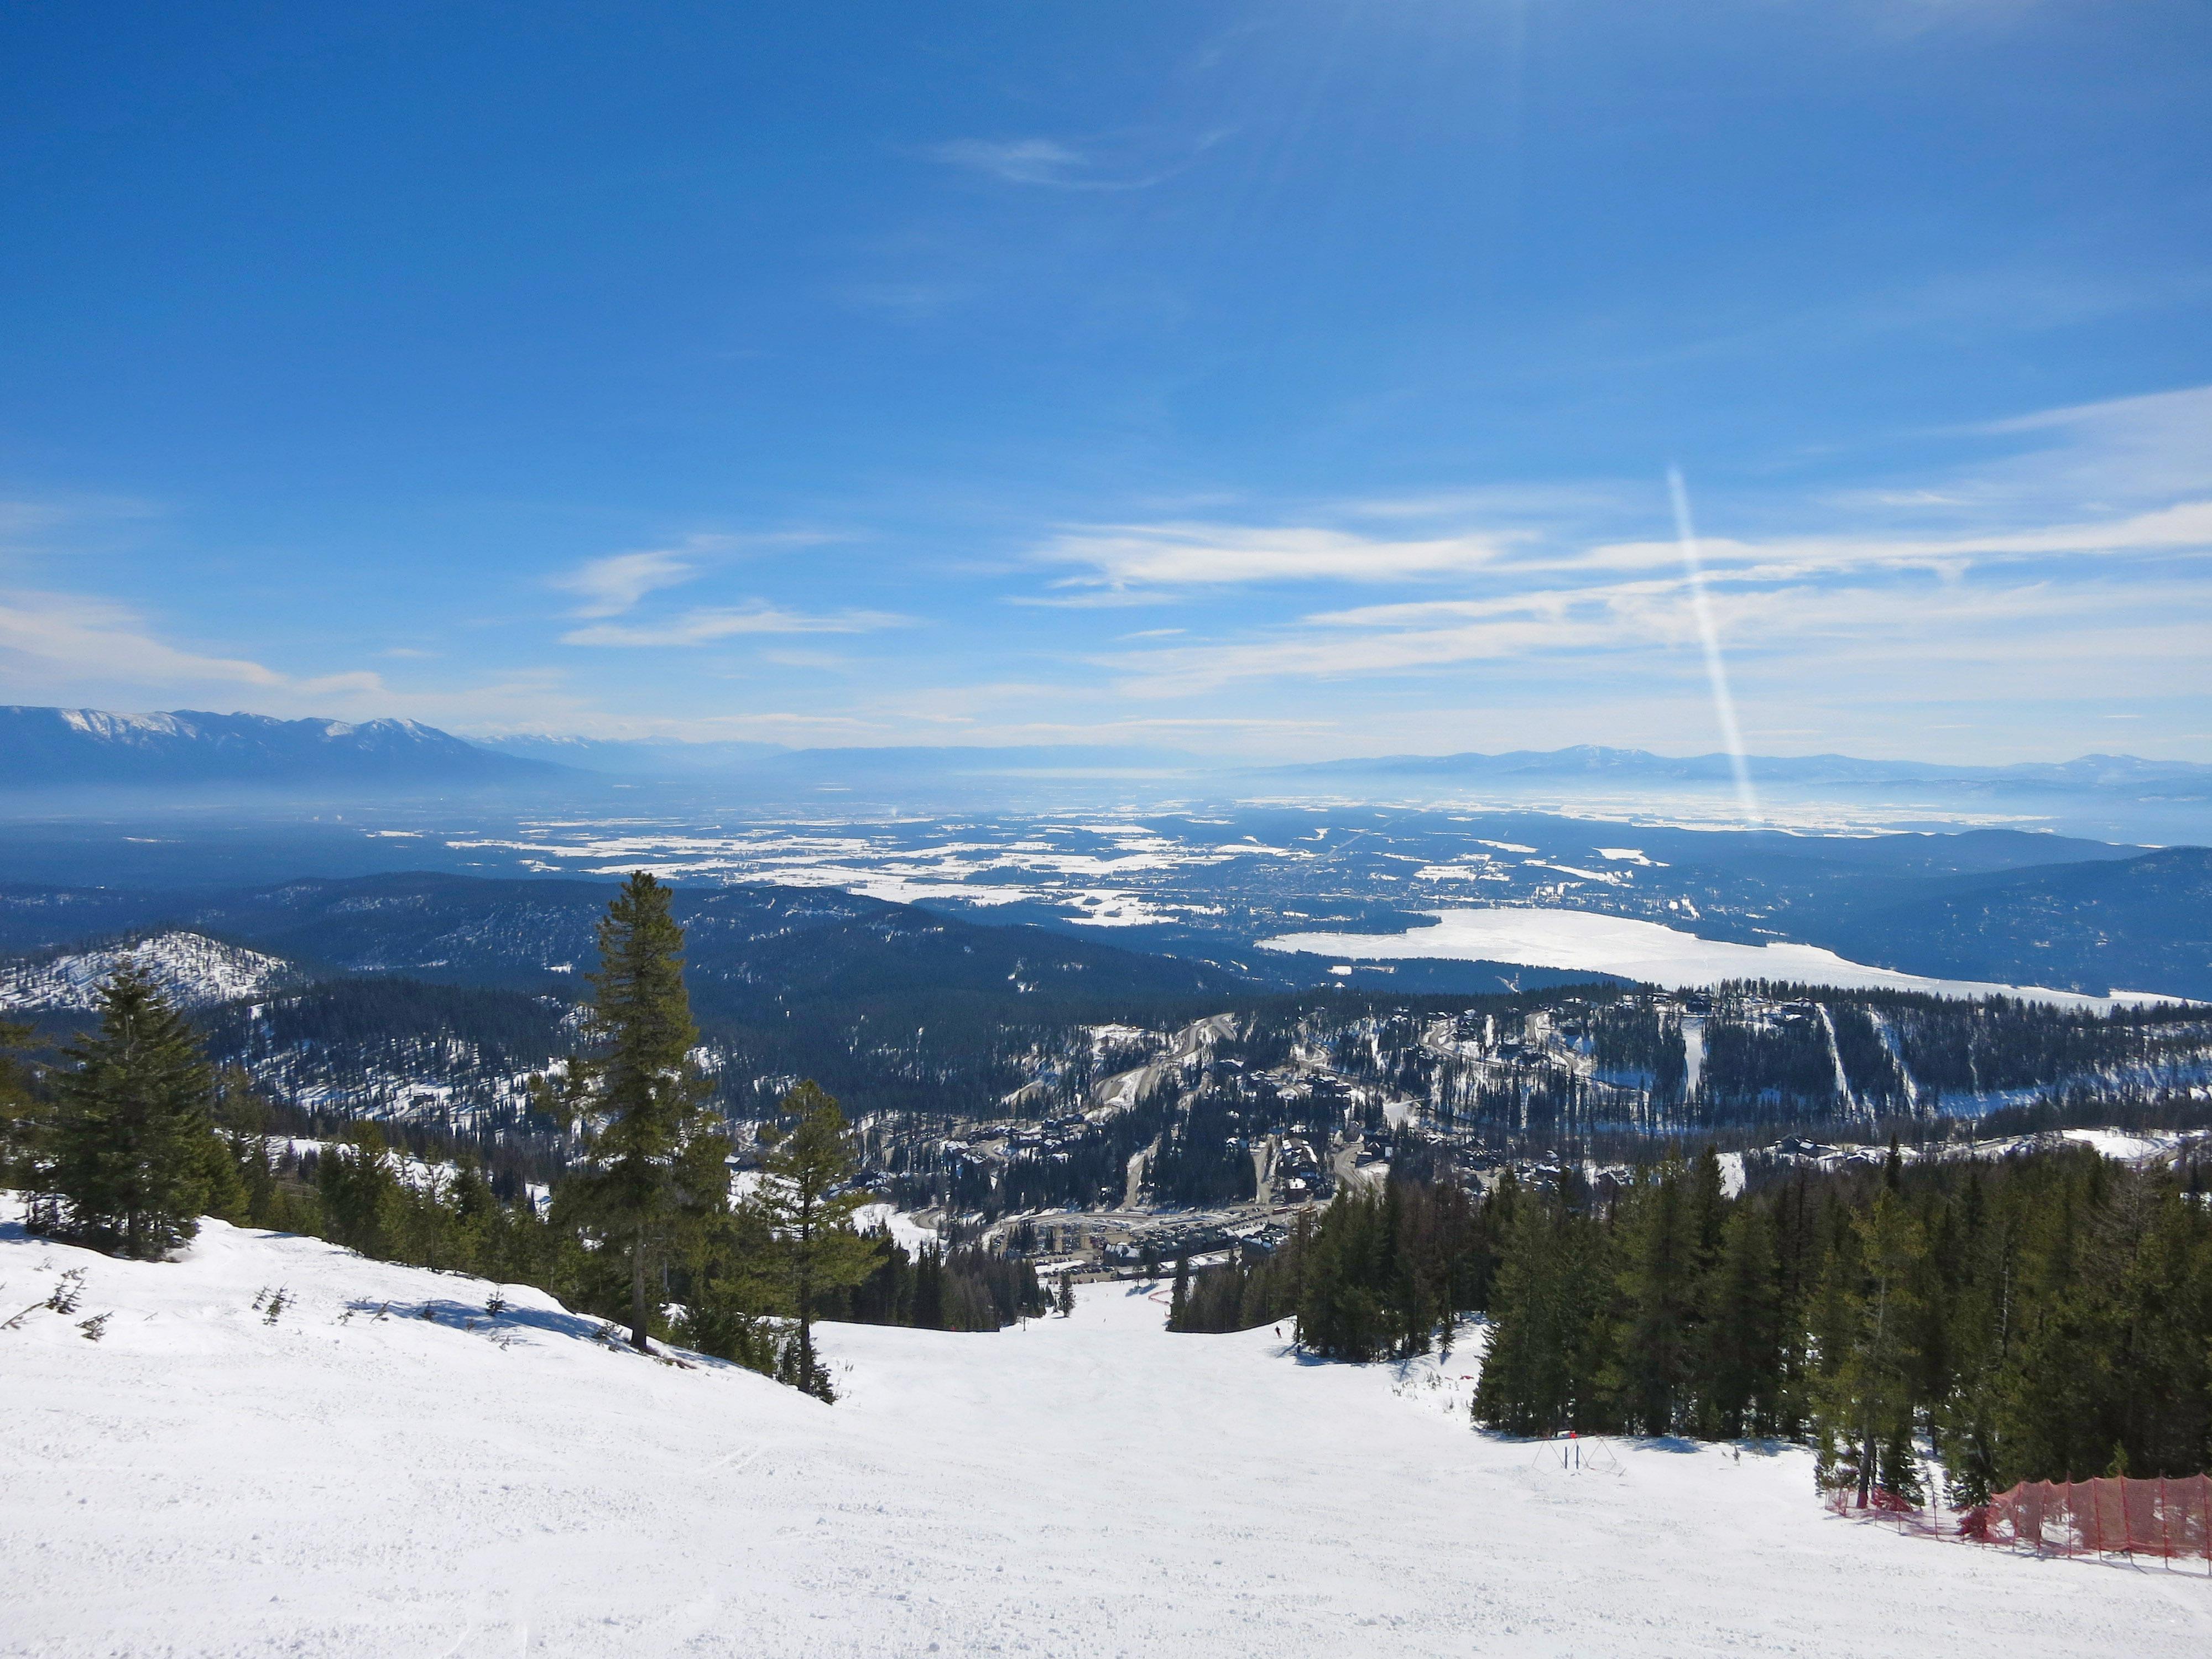 ice fishing chair american girl doll 2015 ski whitefish montana big mountain